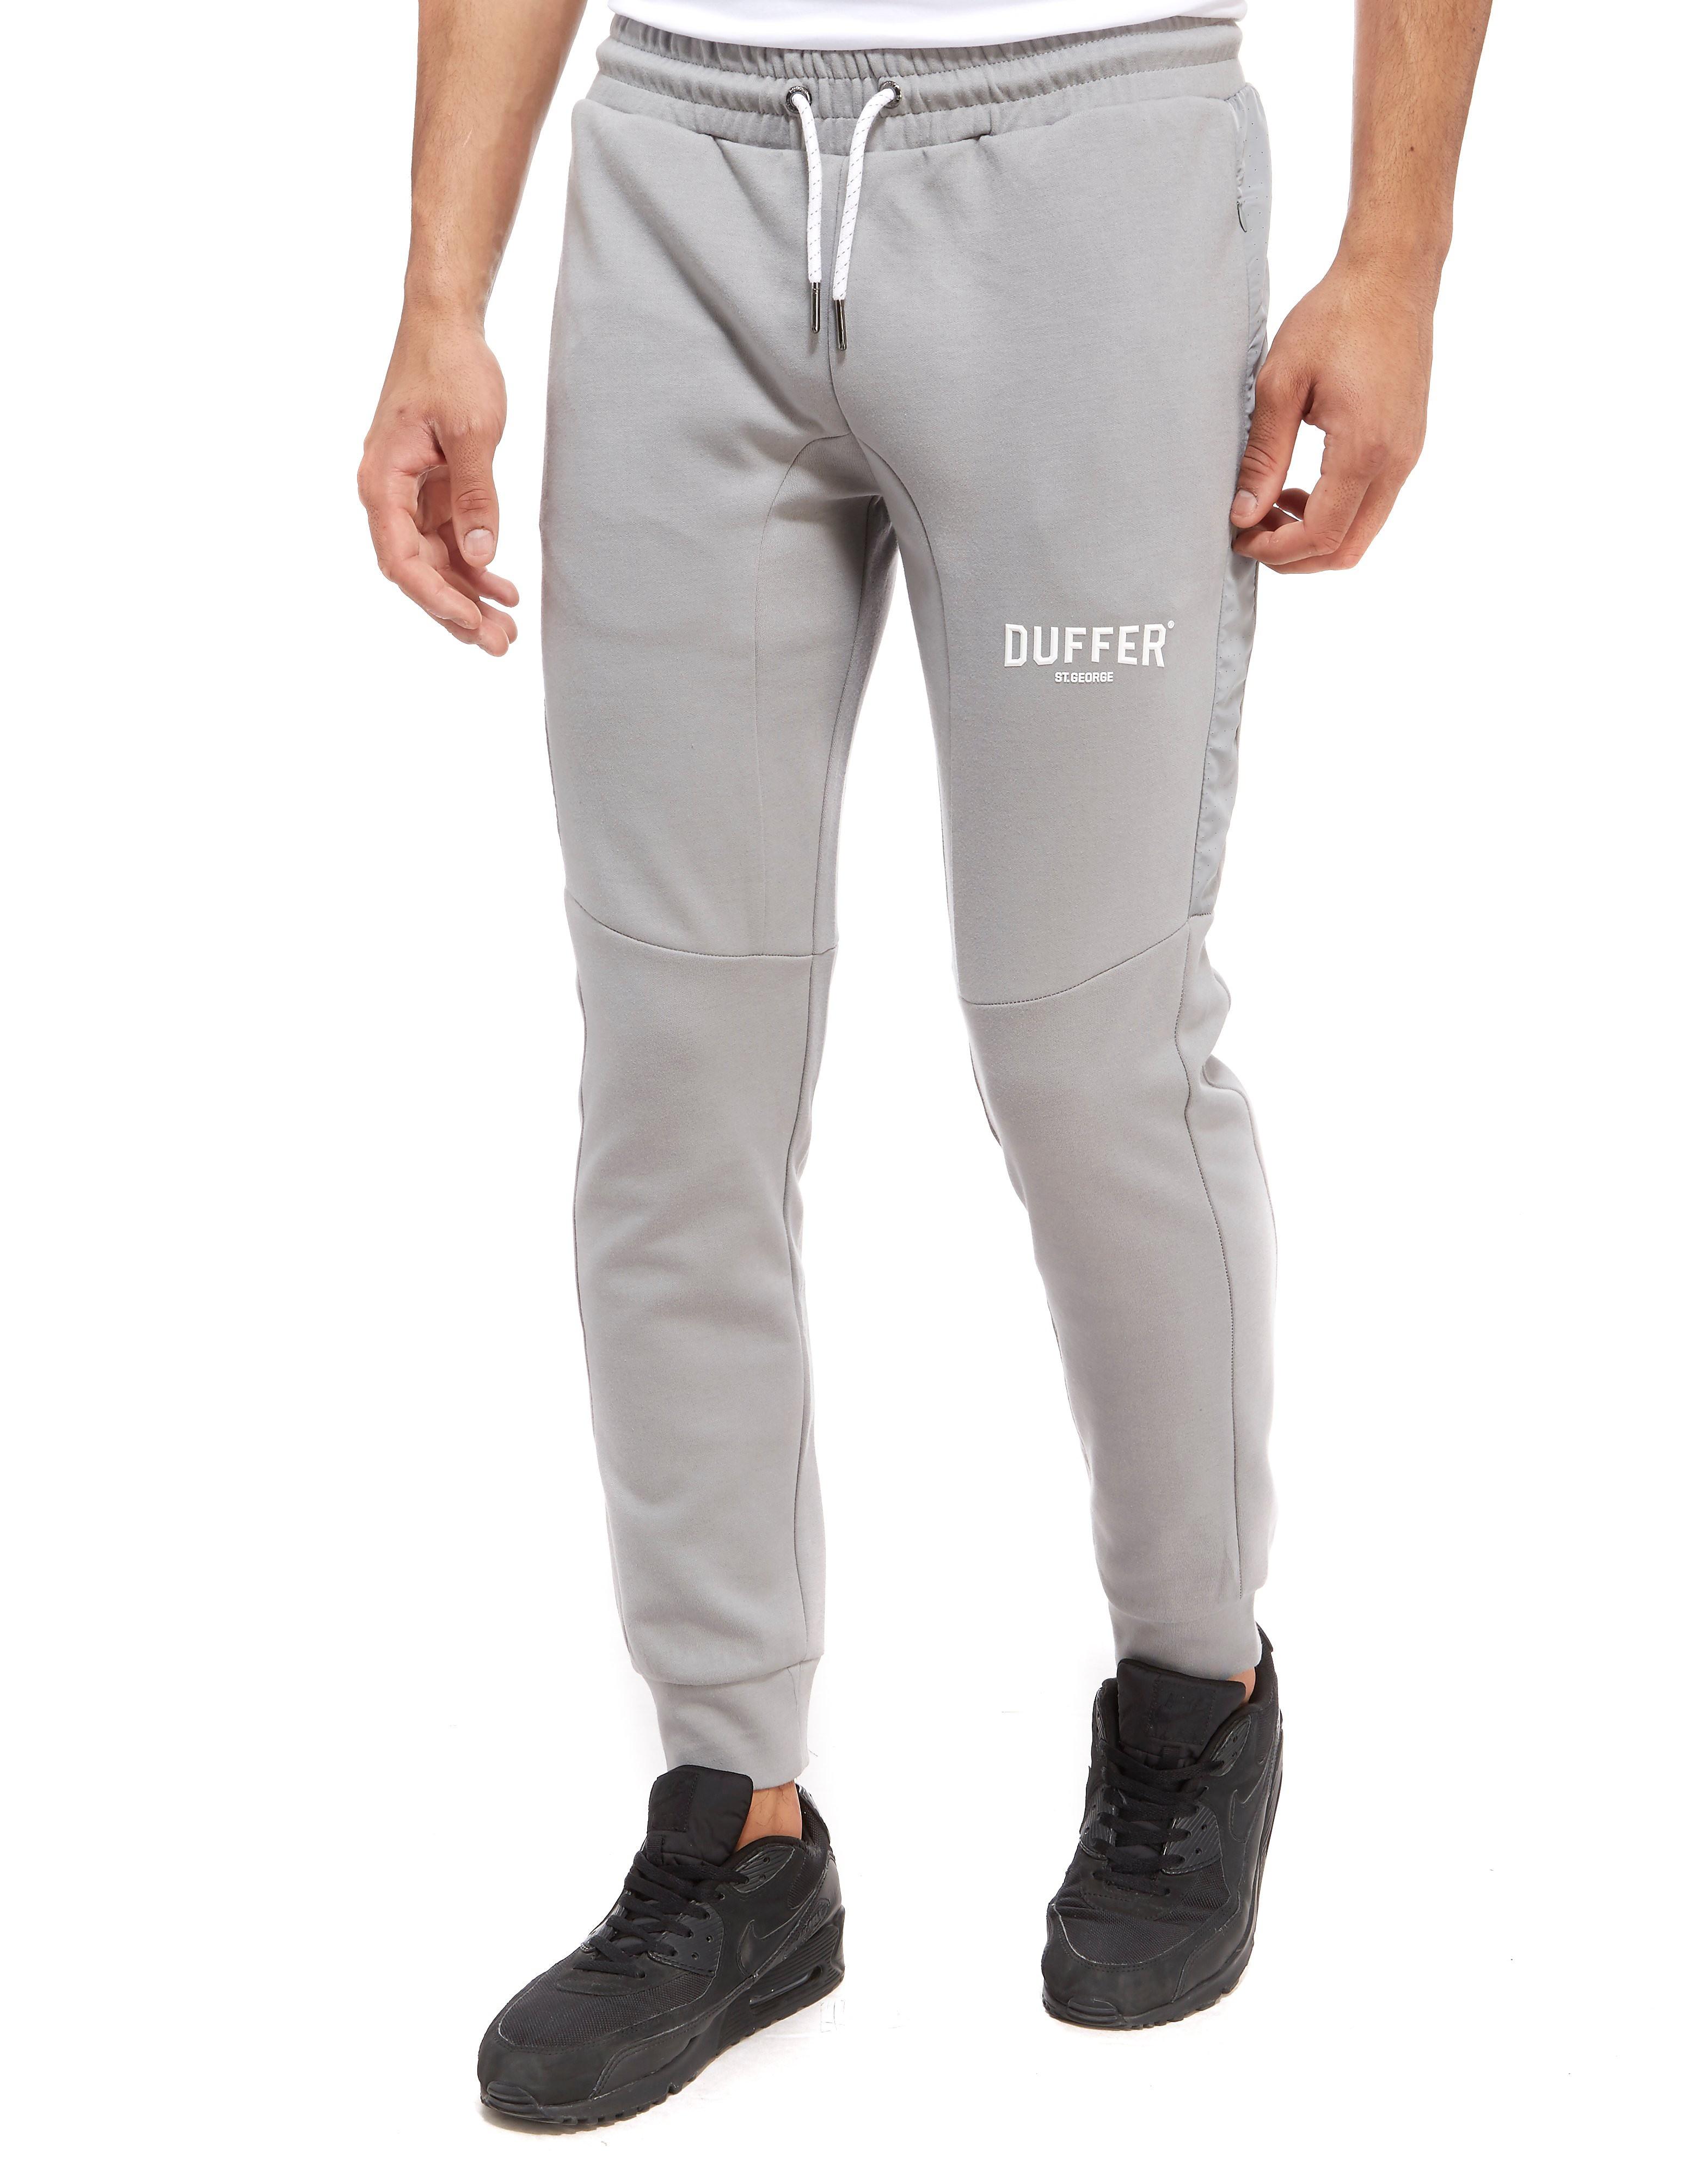 Duffer of St George Entity Jogging Pants